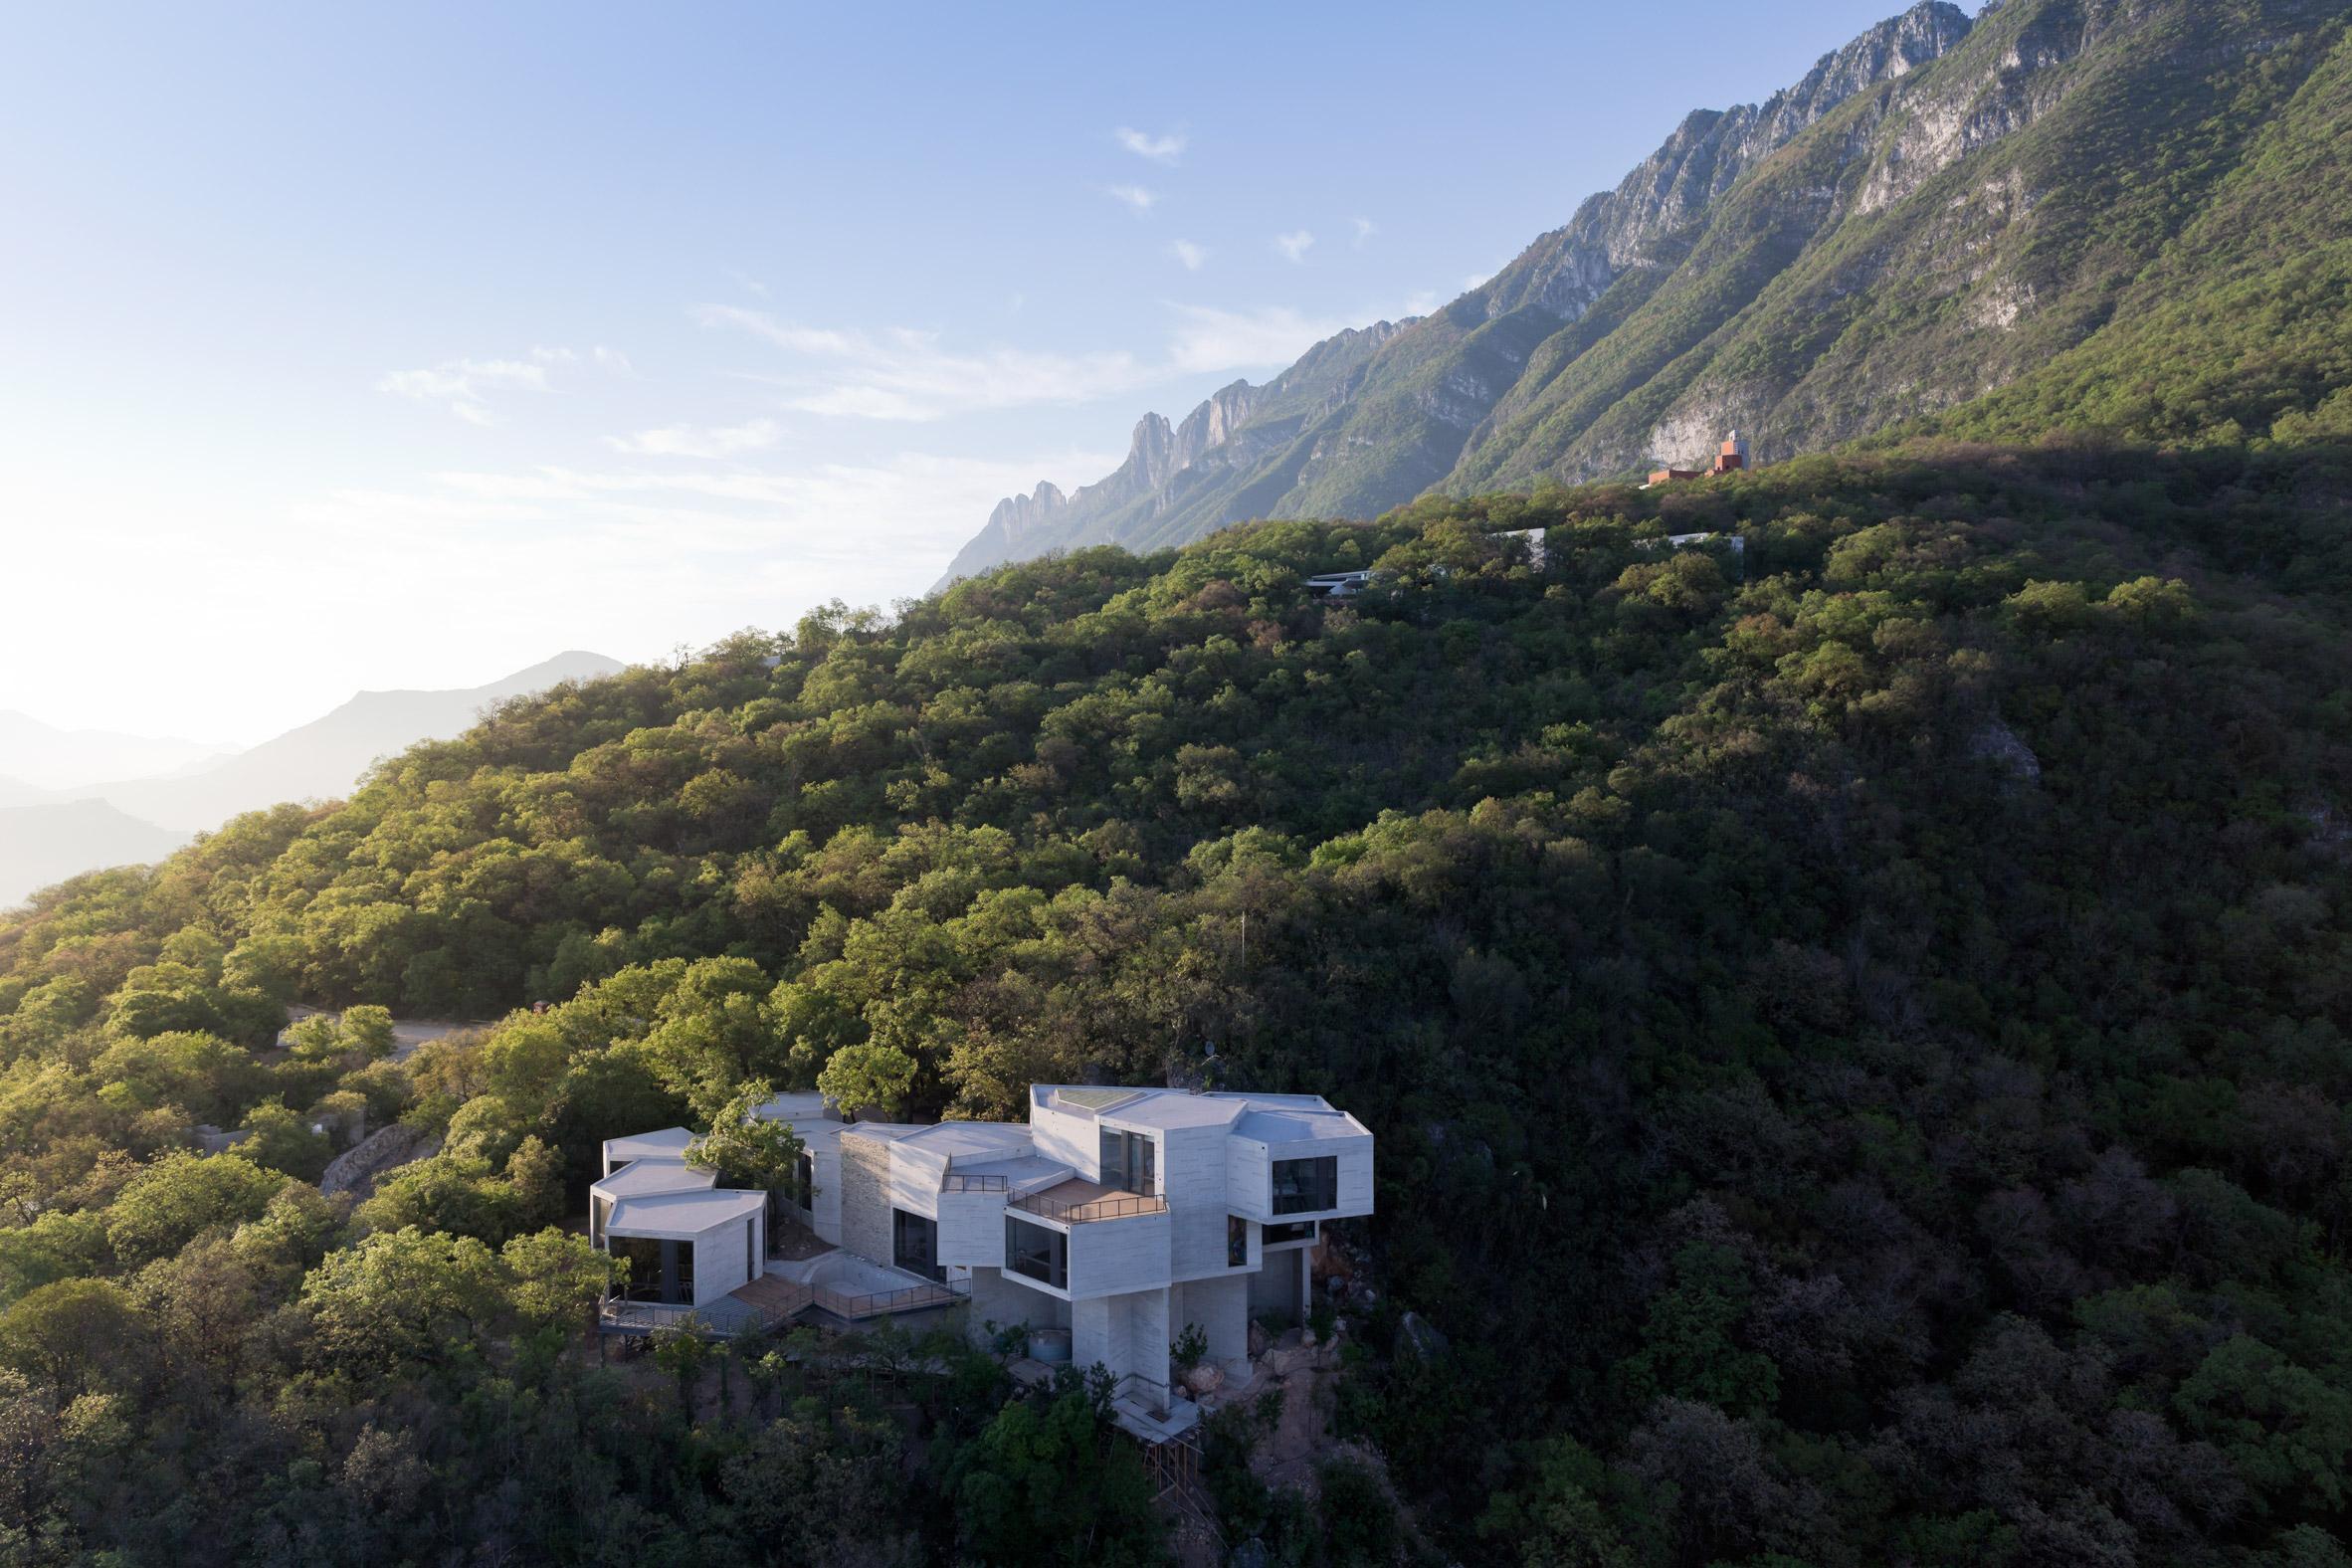 Casa Ventura by Tatiana Bilbao Estudio. Photo is by Iwan Baan